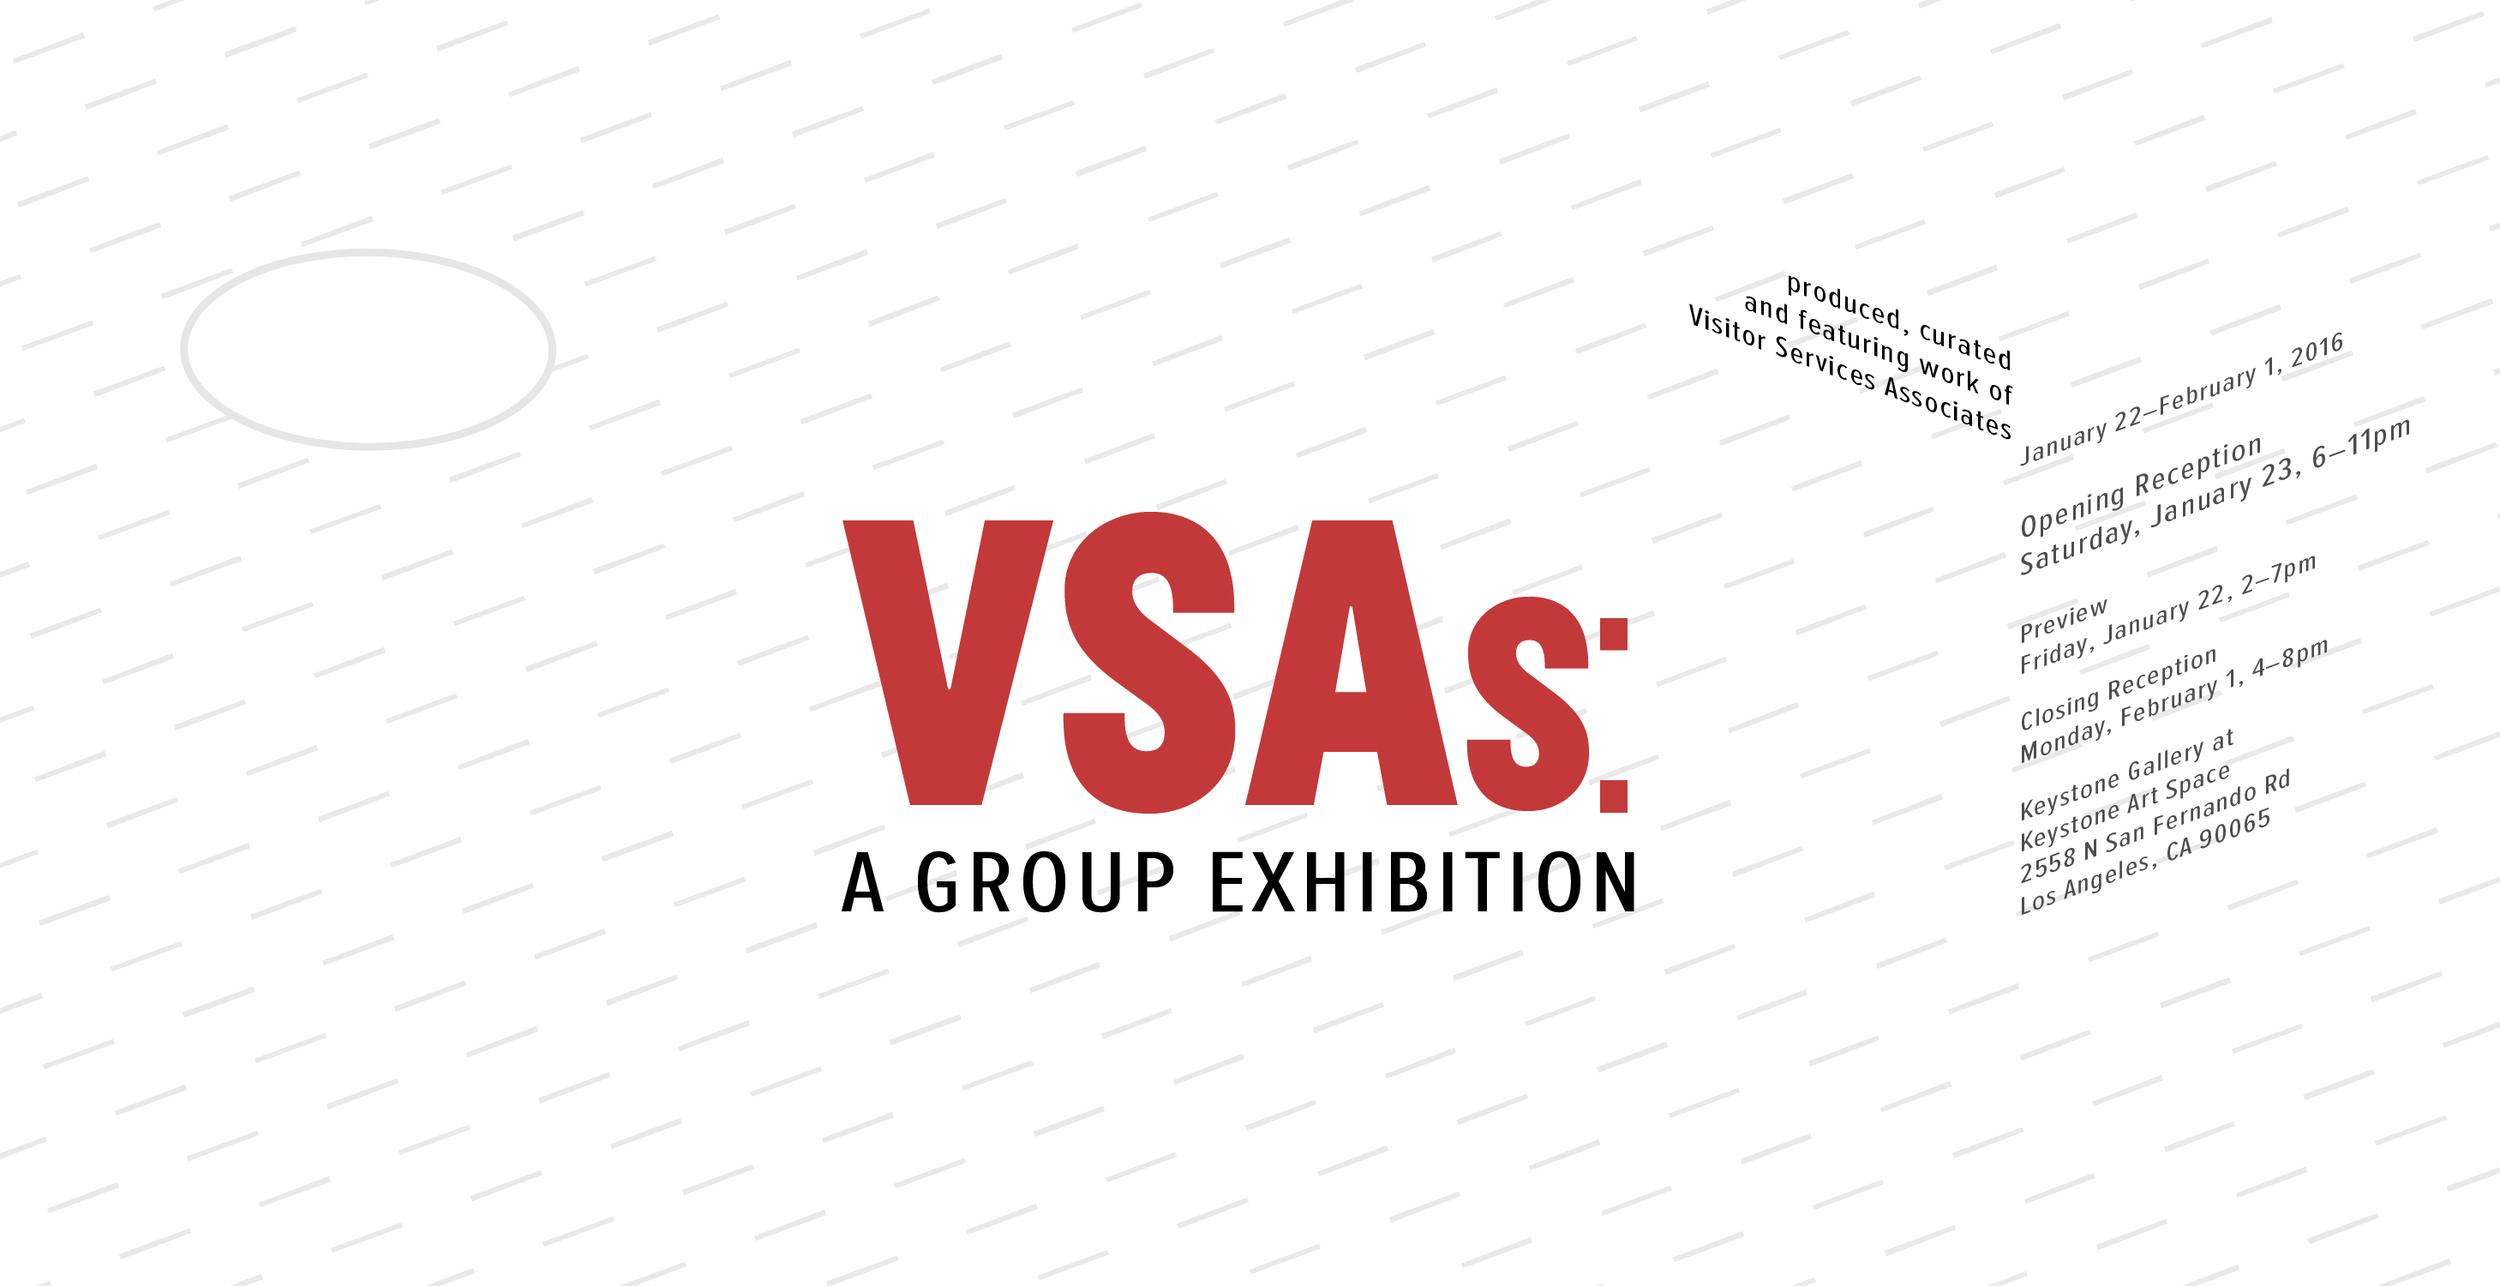 VSAs: A Group Exhibition at Keystone Art Space, January 22–February 1, 2016.